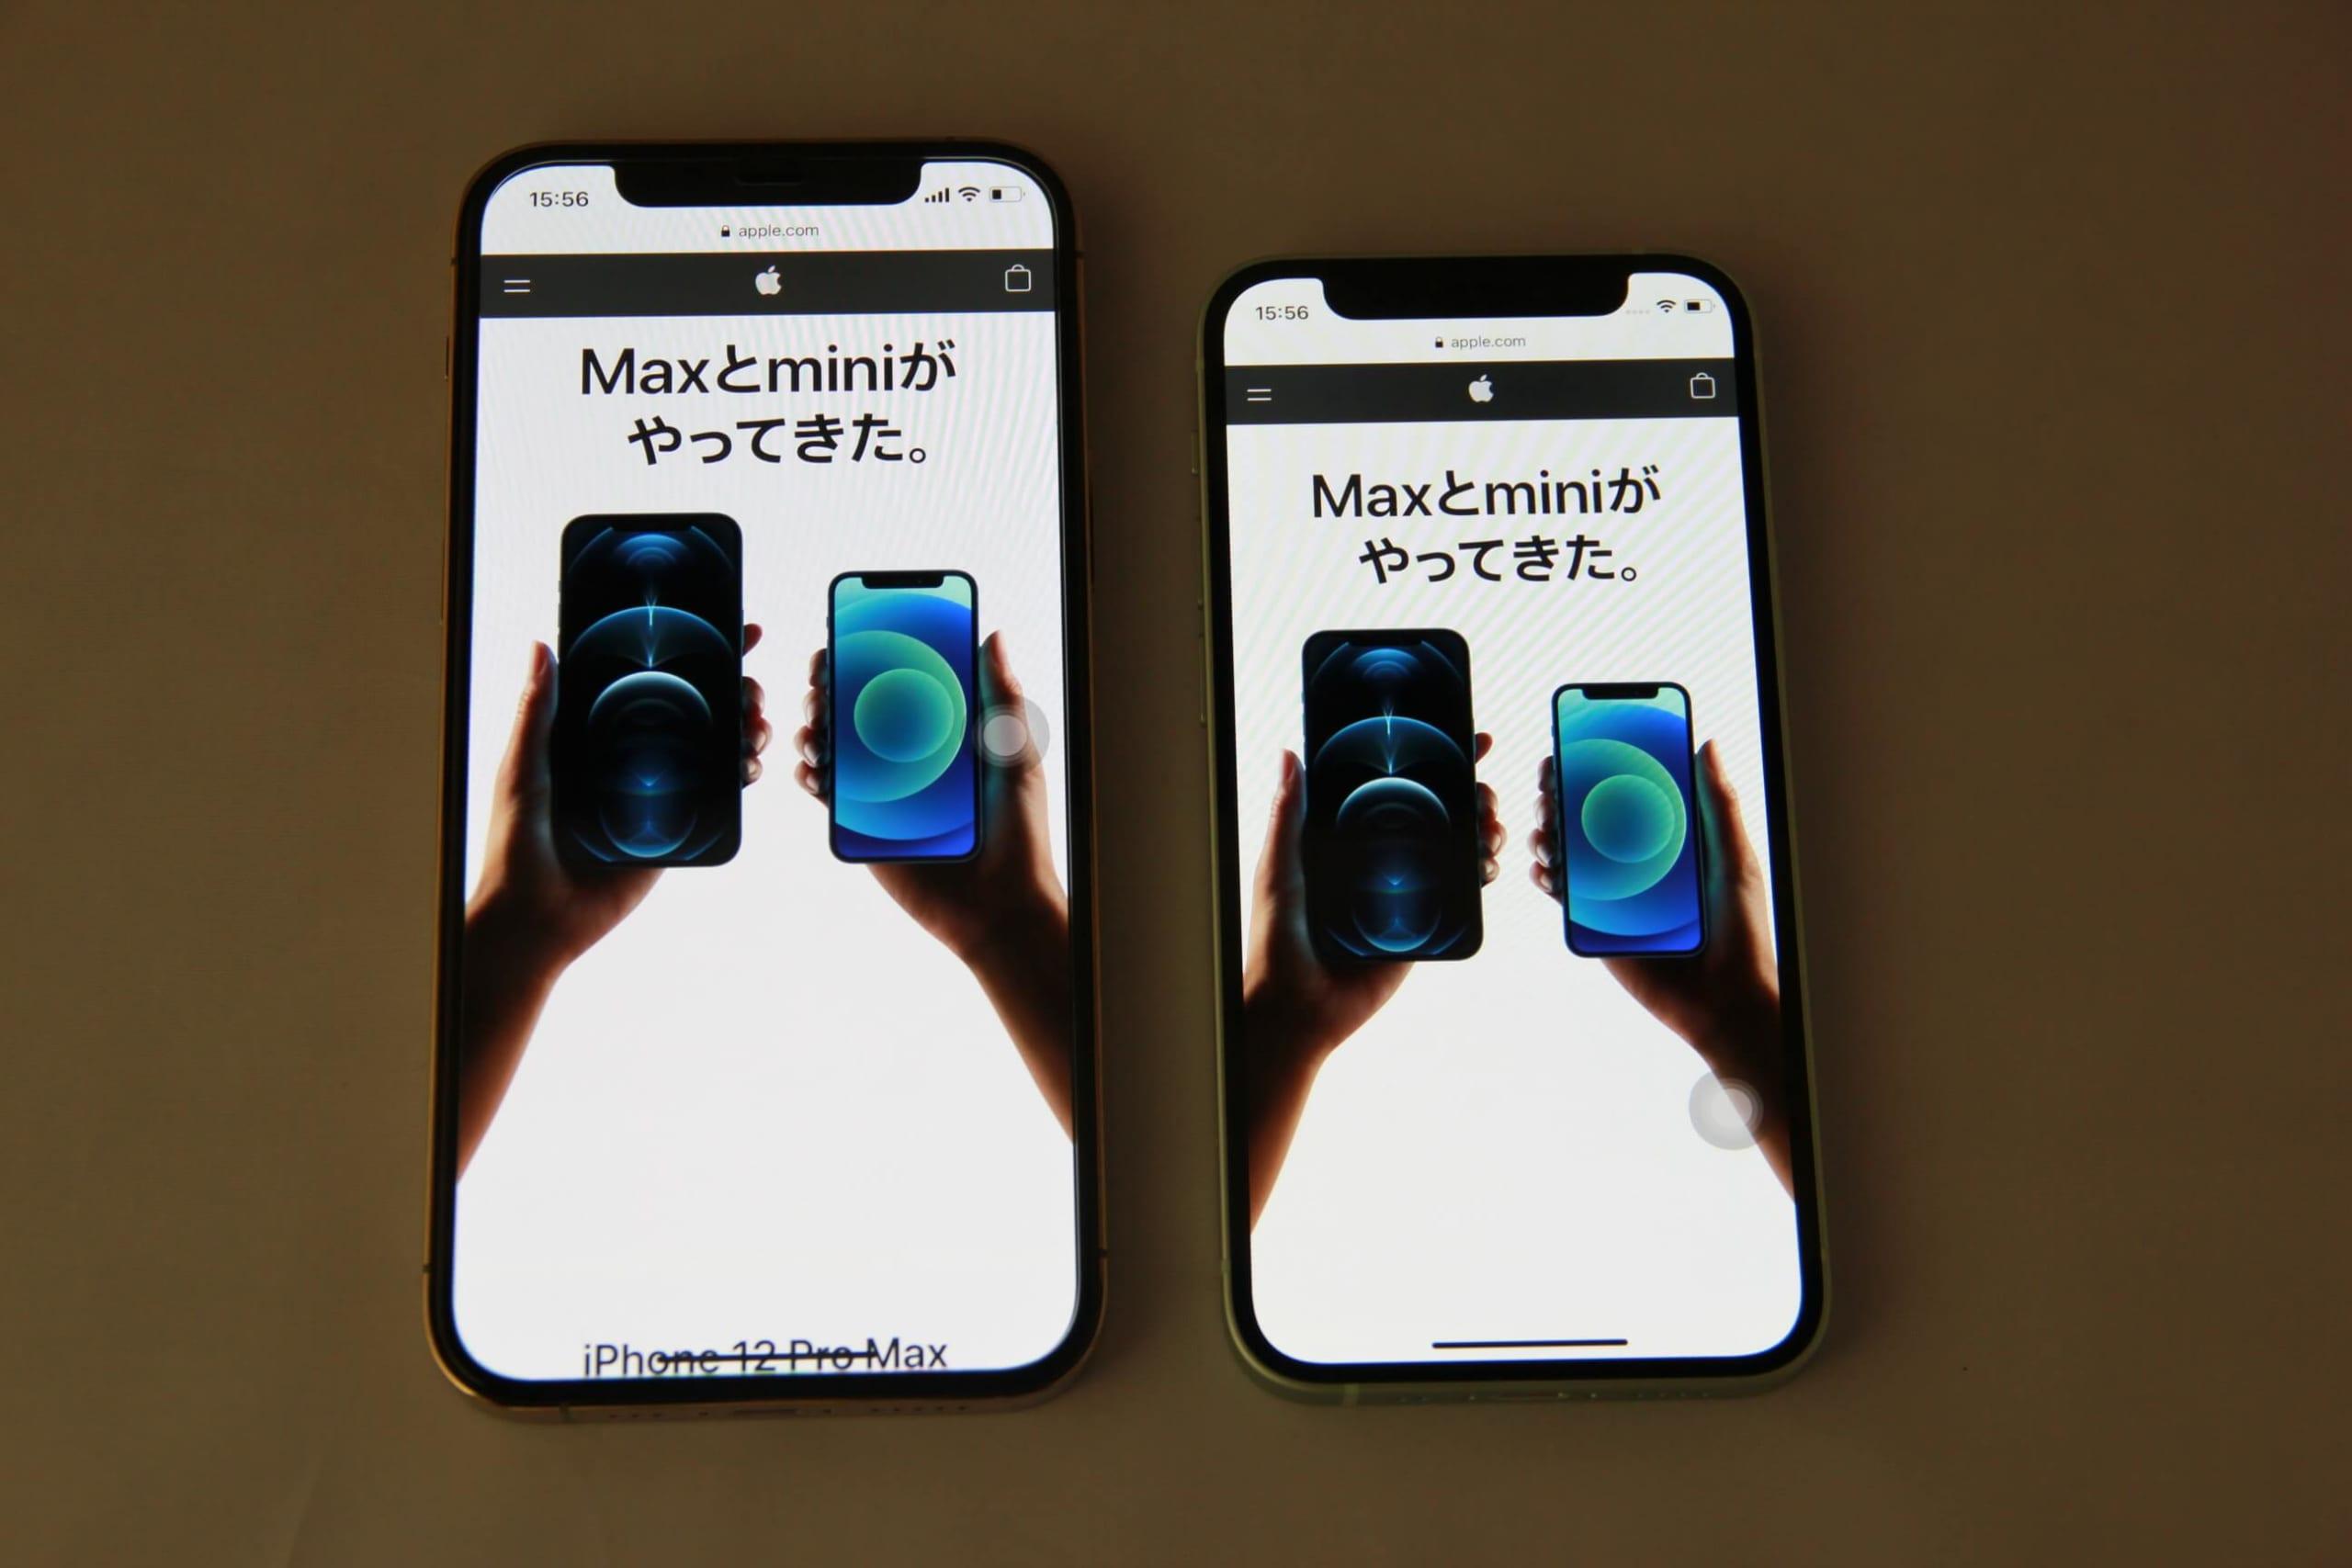 iPhone 12 mini Pro